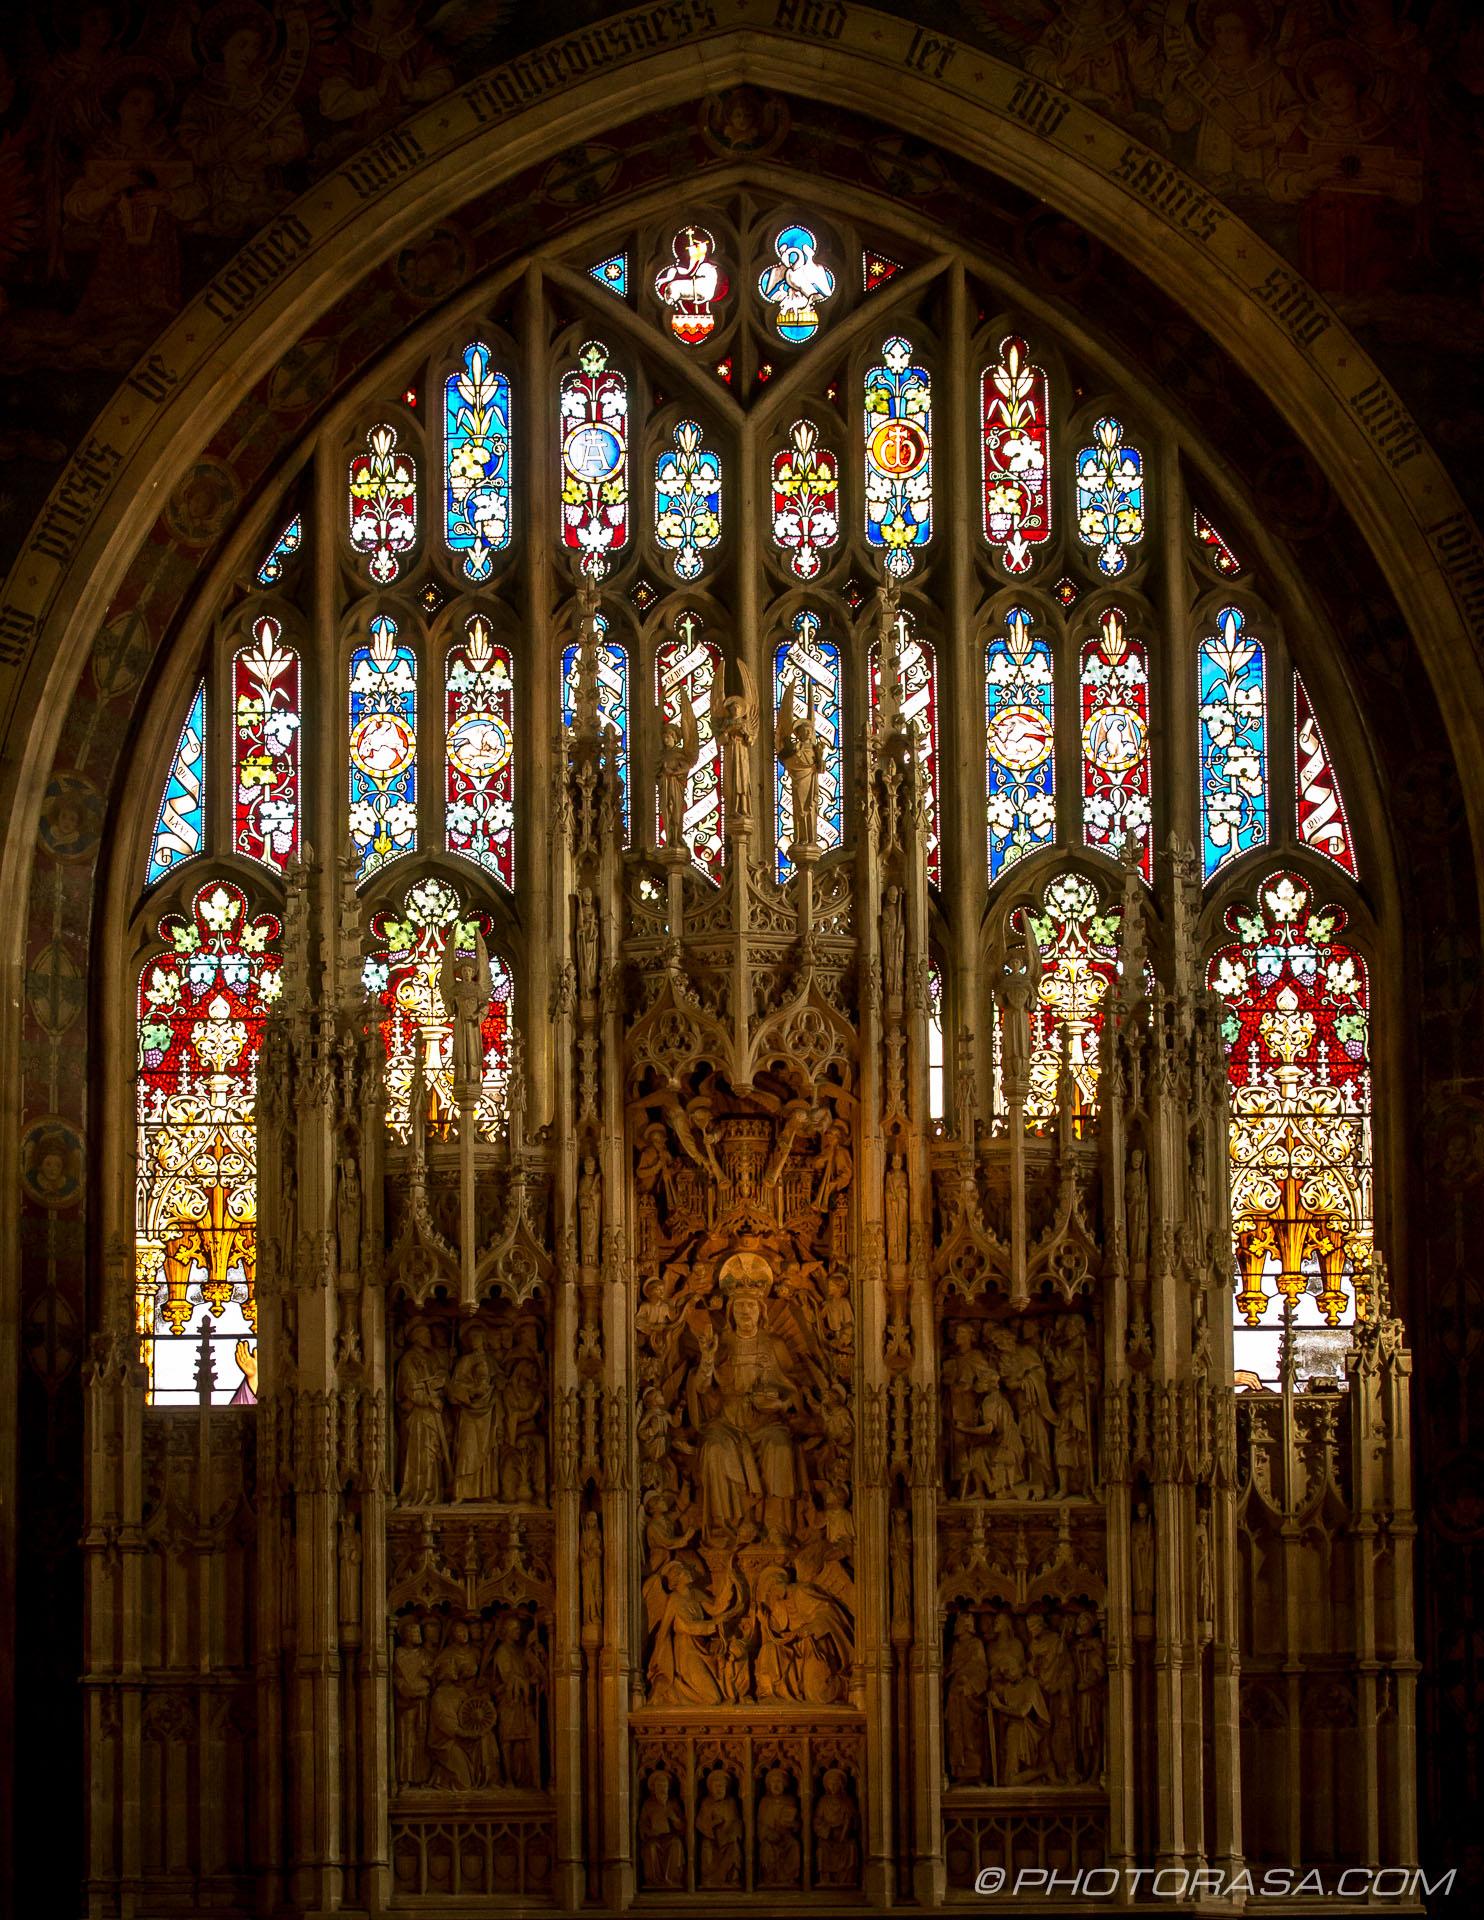 https://photorasa.com/inside-all-saints-church-in-maidstone/all-saints-maidstone-stained-glass-window/